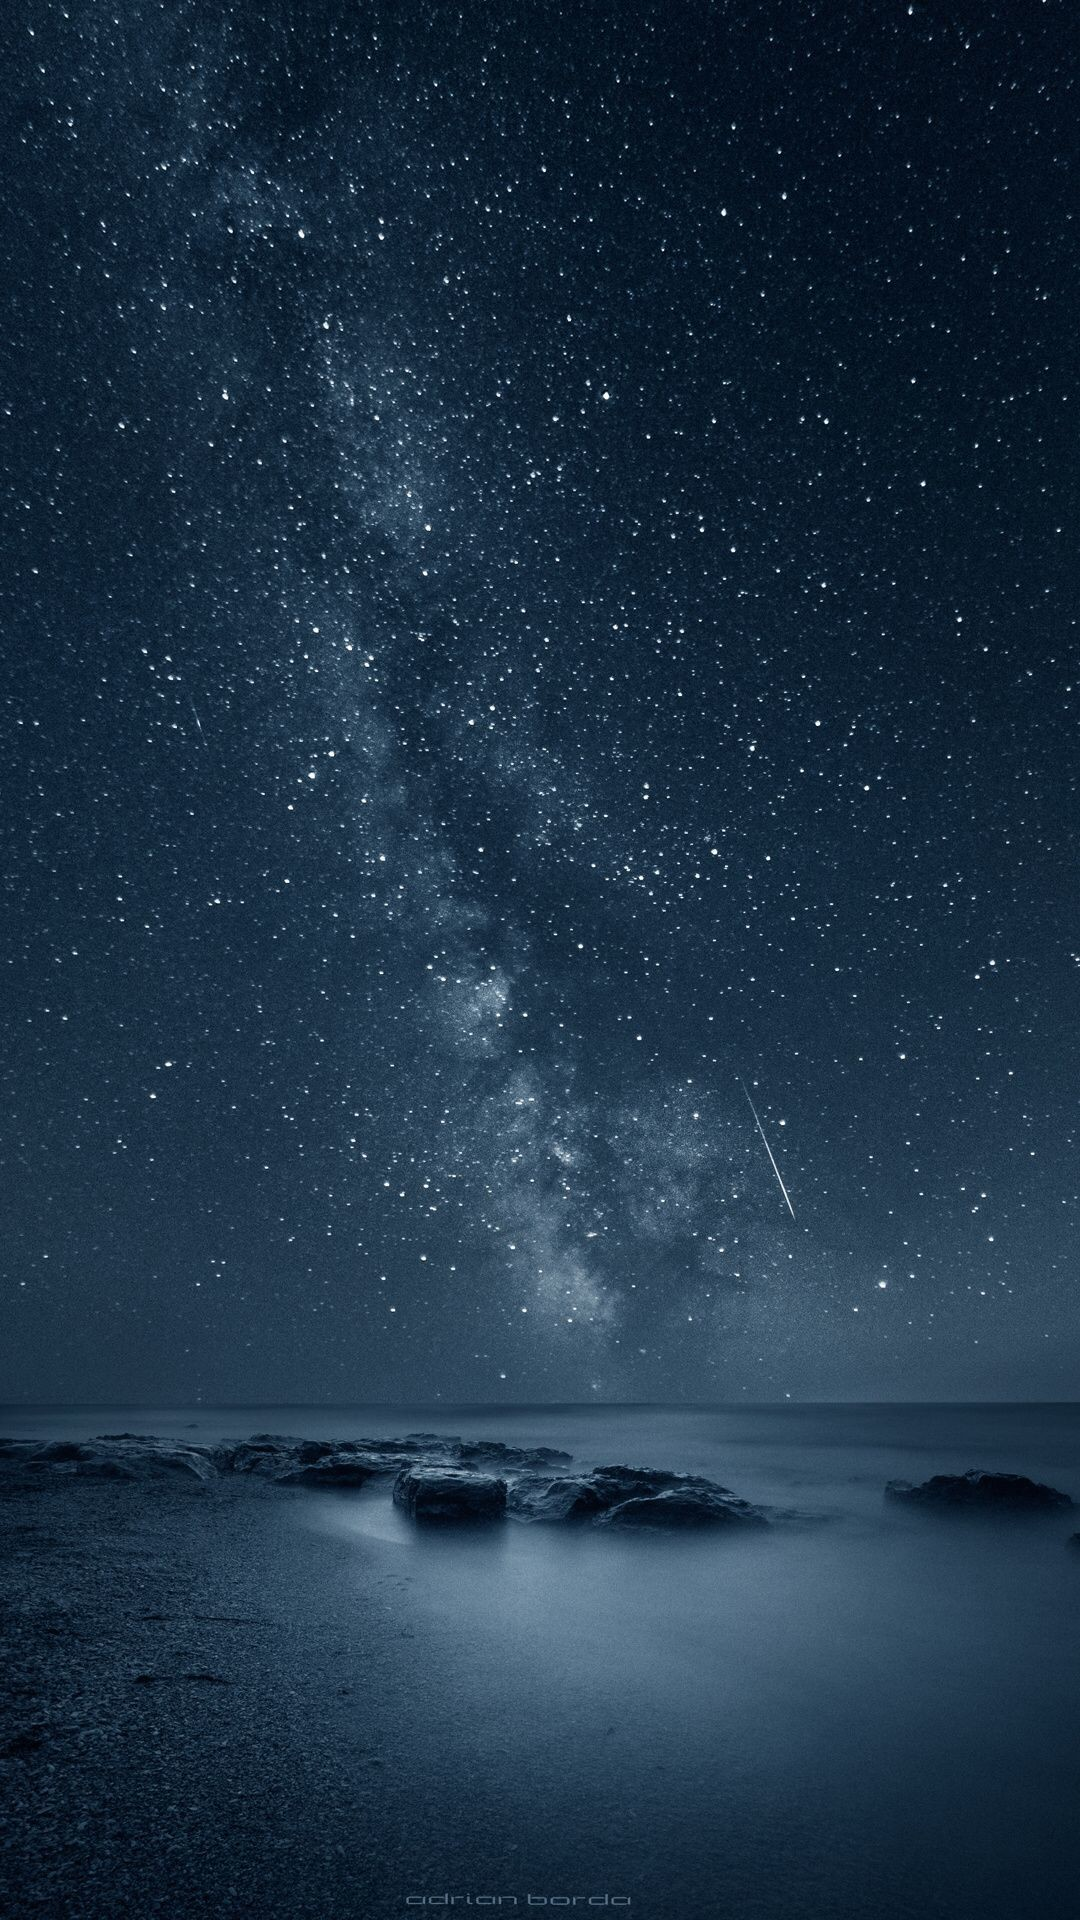 Night Sky Phone Wallpaper 75 Images